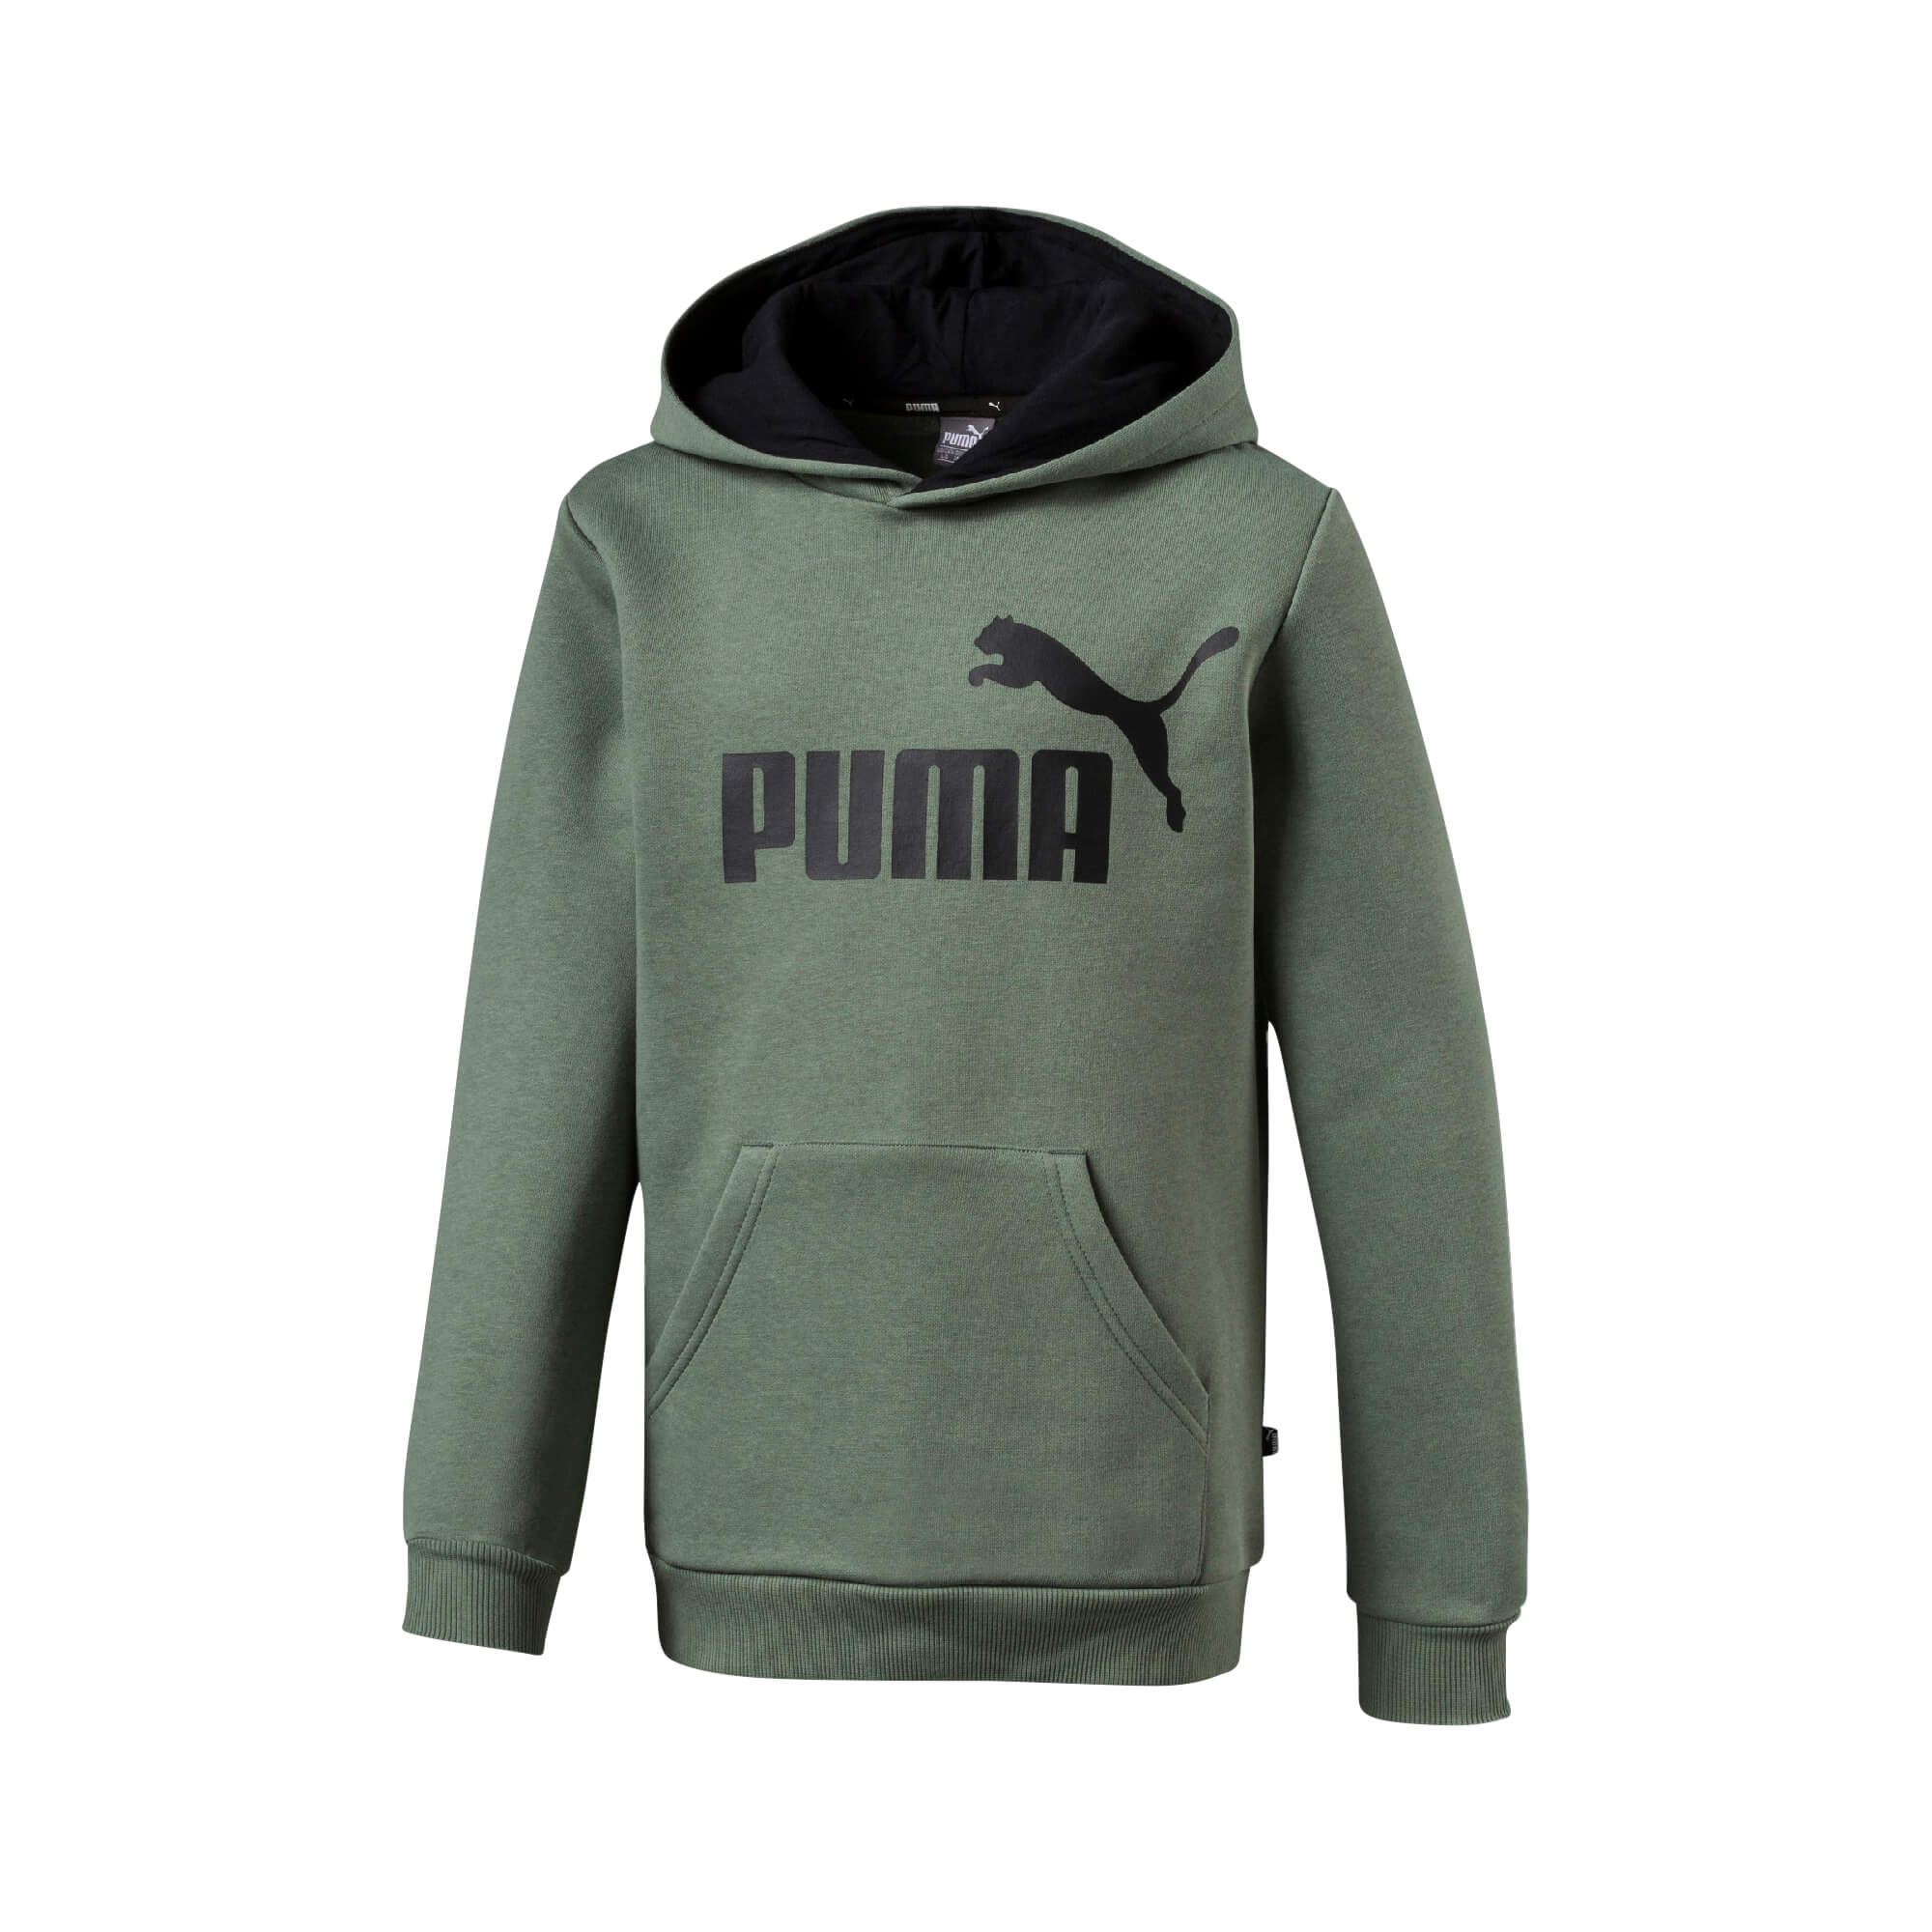 7ee4a2a577a2 Puma Dječji pulover Olivna 140 ESS Logo Hoody - Jeftinije.hr